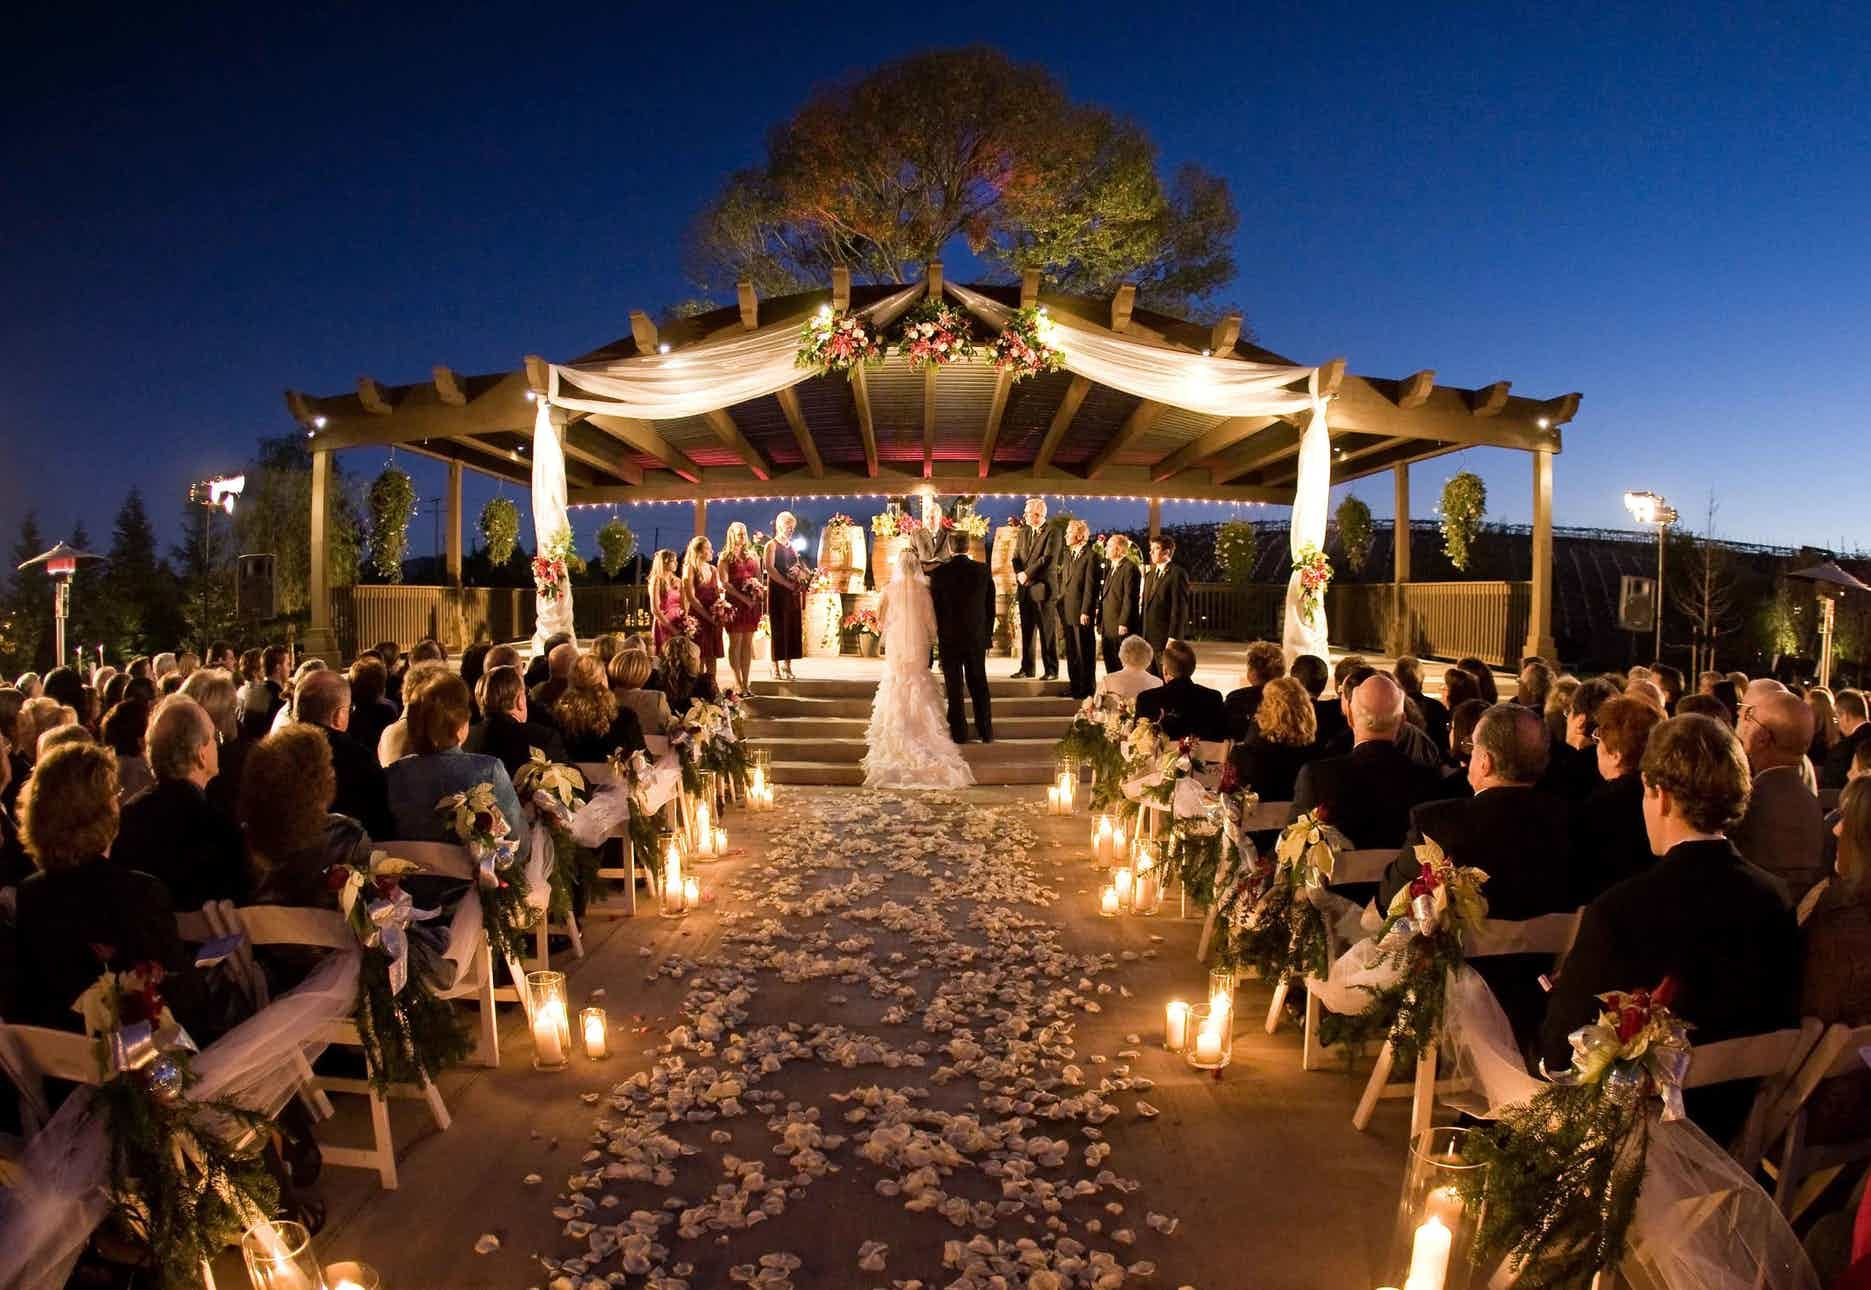 Wilson Creek Winery Wedding Venue Temecula Ca 92591 Outdoor Night Wedding Night Time Wedding Outdoor Evening Wedding